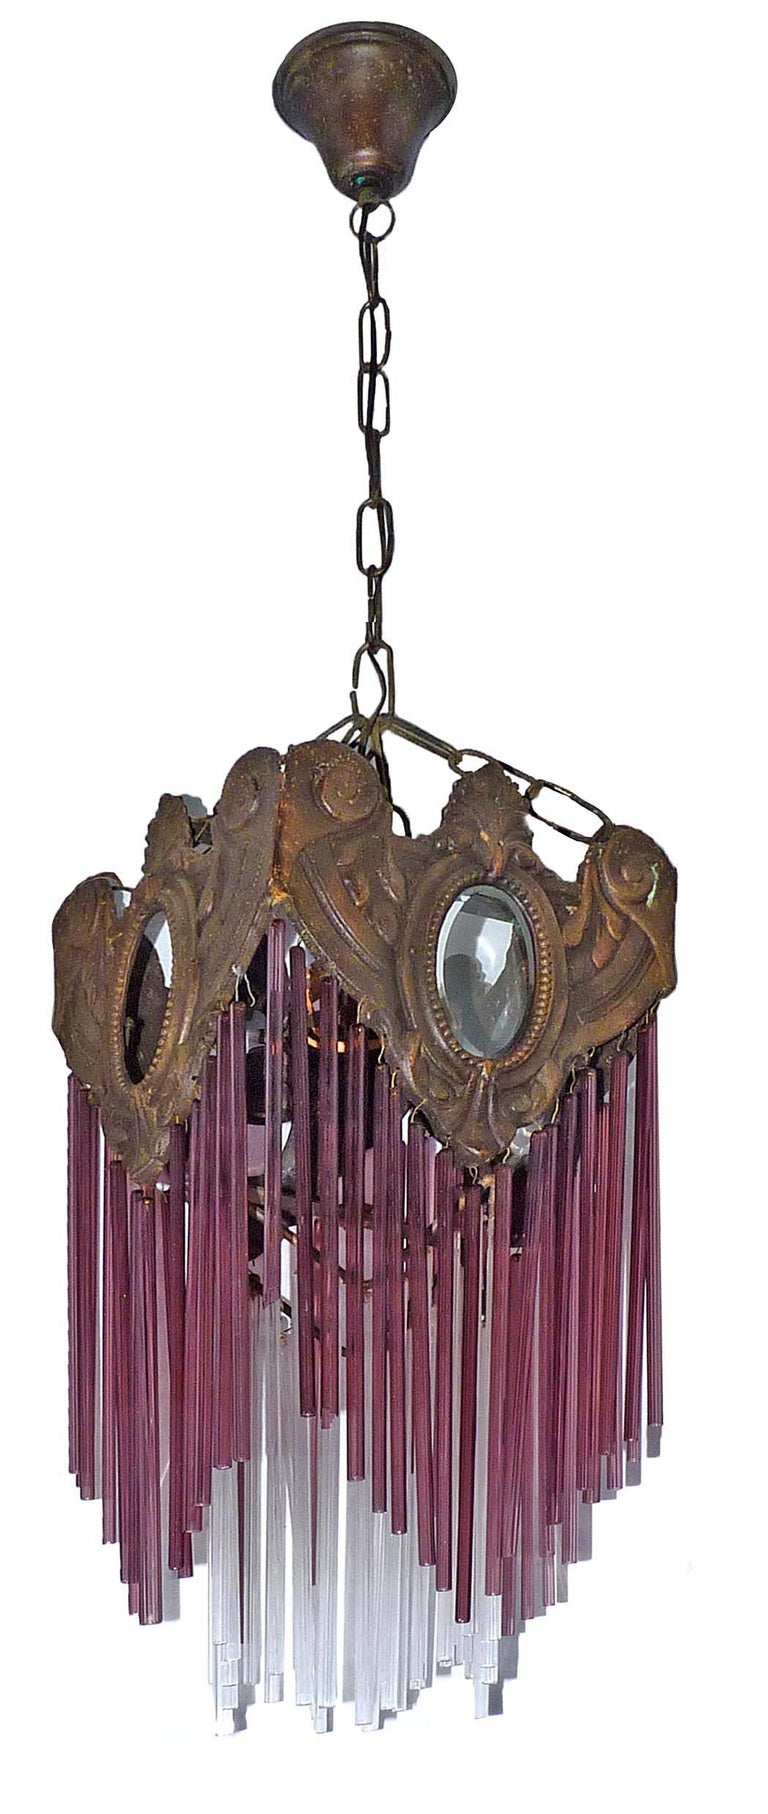 French Art Nouveau & Art Deco Bronze Purple Pink Glass Fringe Chandelier Lantern For Sale 1